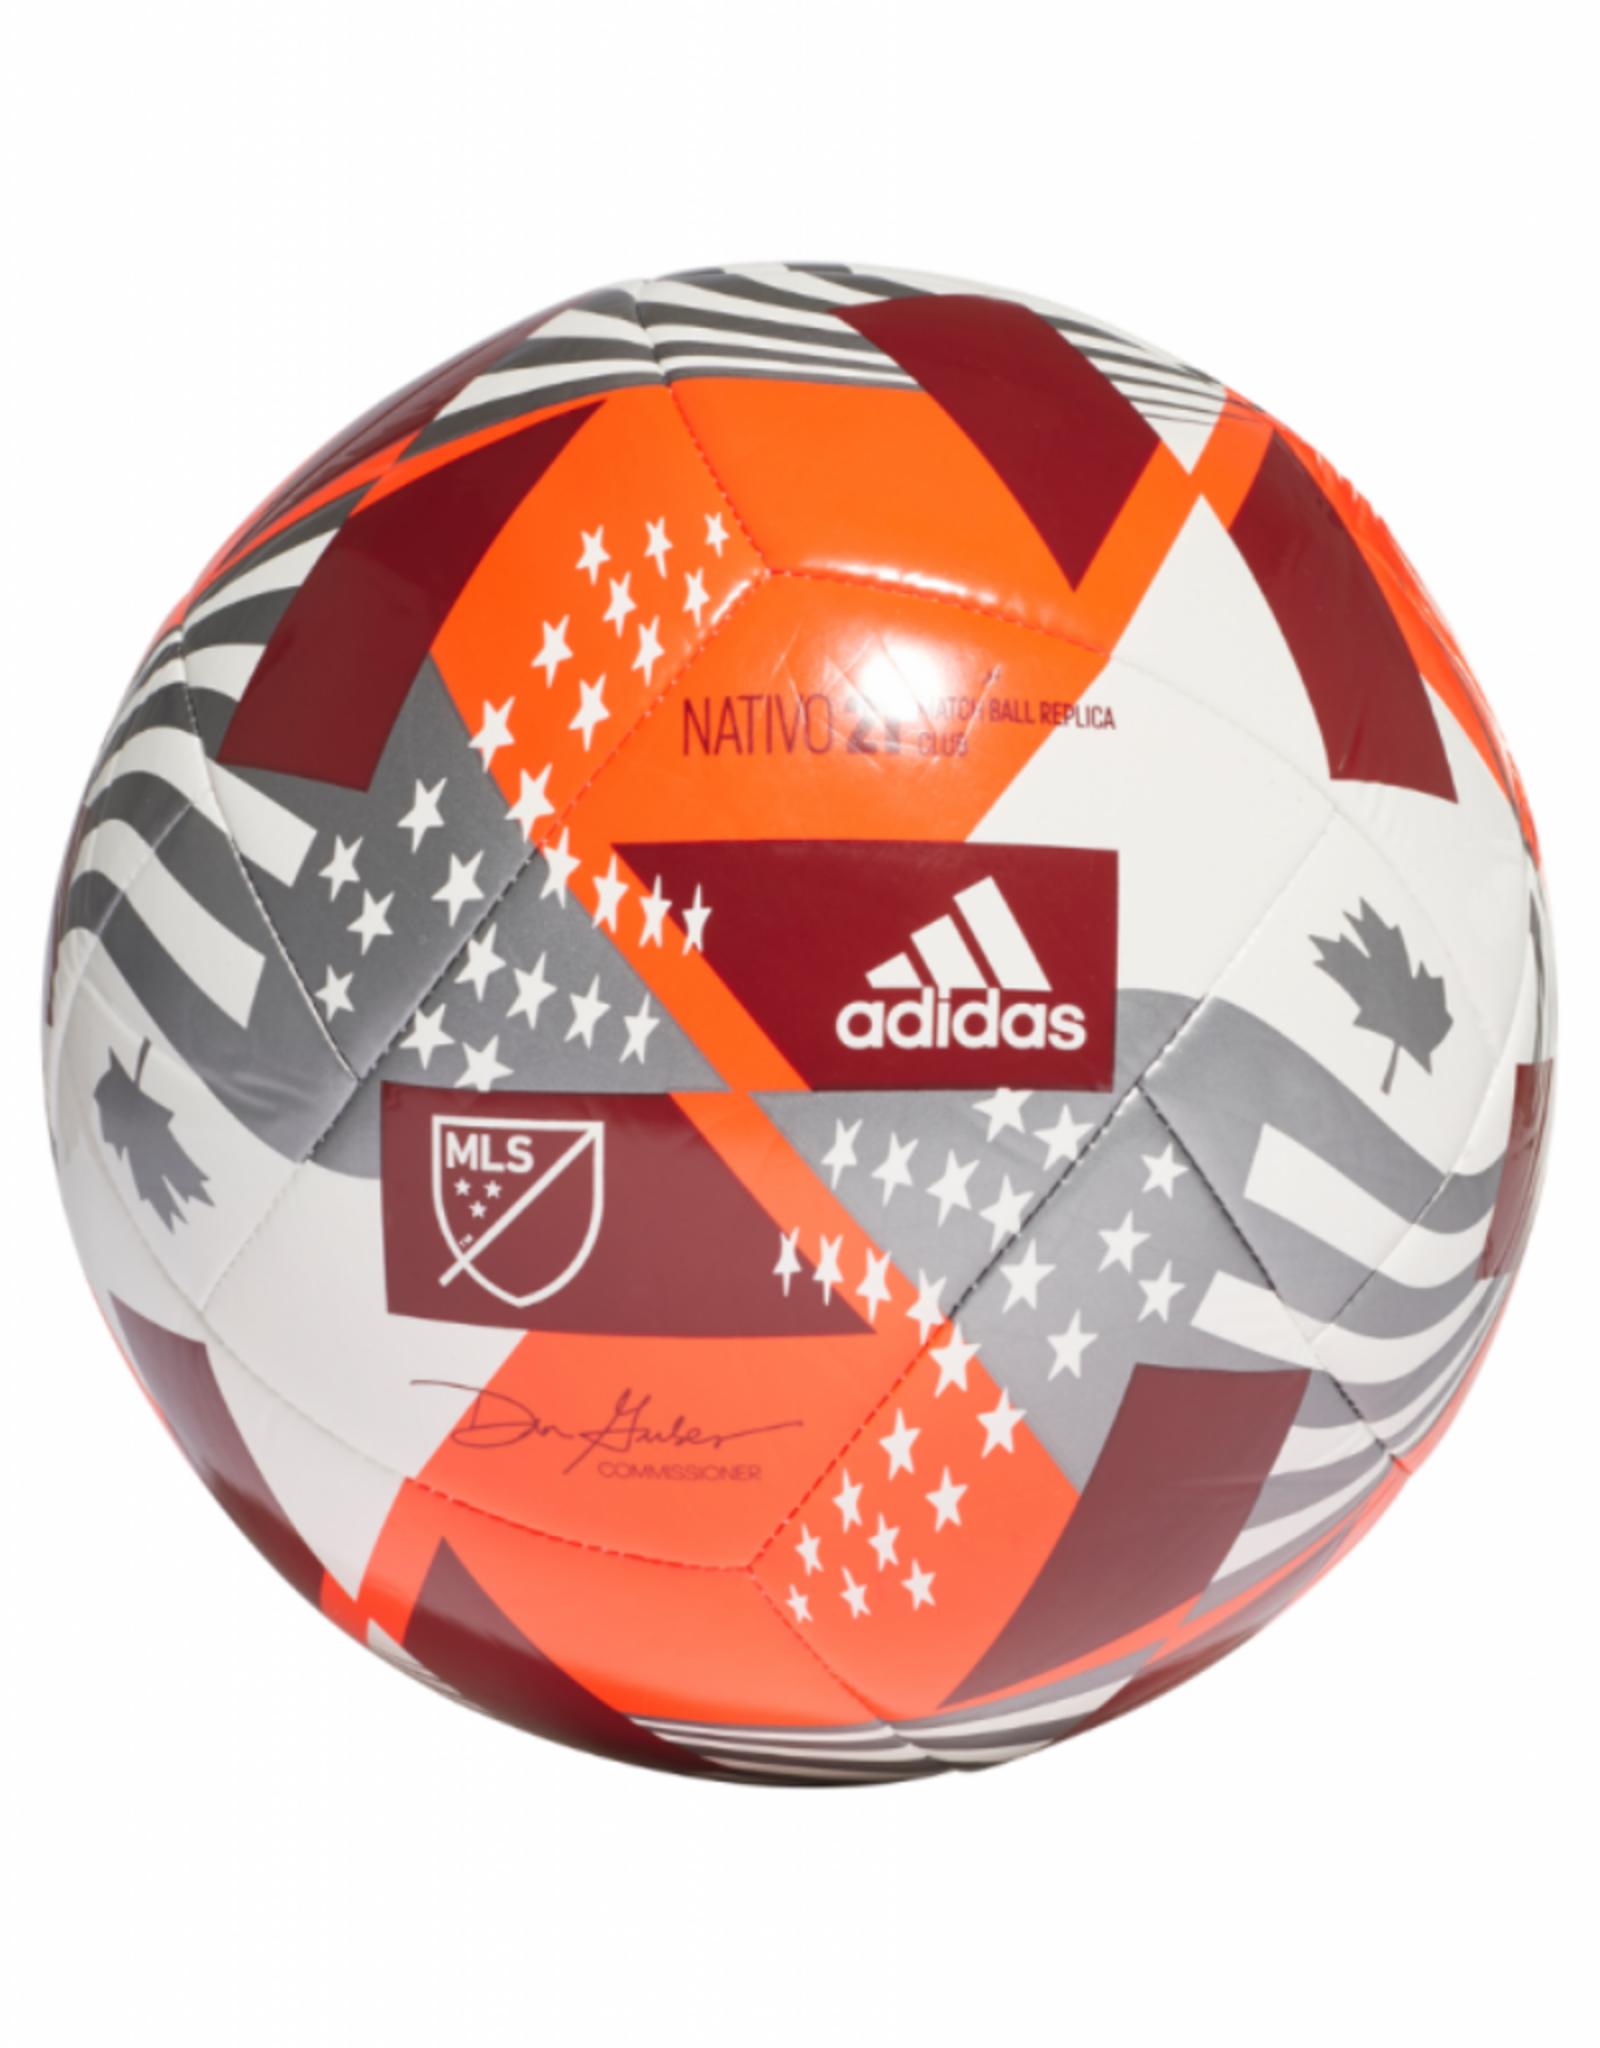 Adidas Adidas 2021 MLS Club Soccer Ball Size 5 Red/White